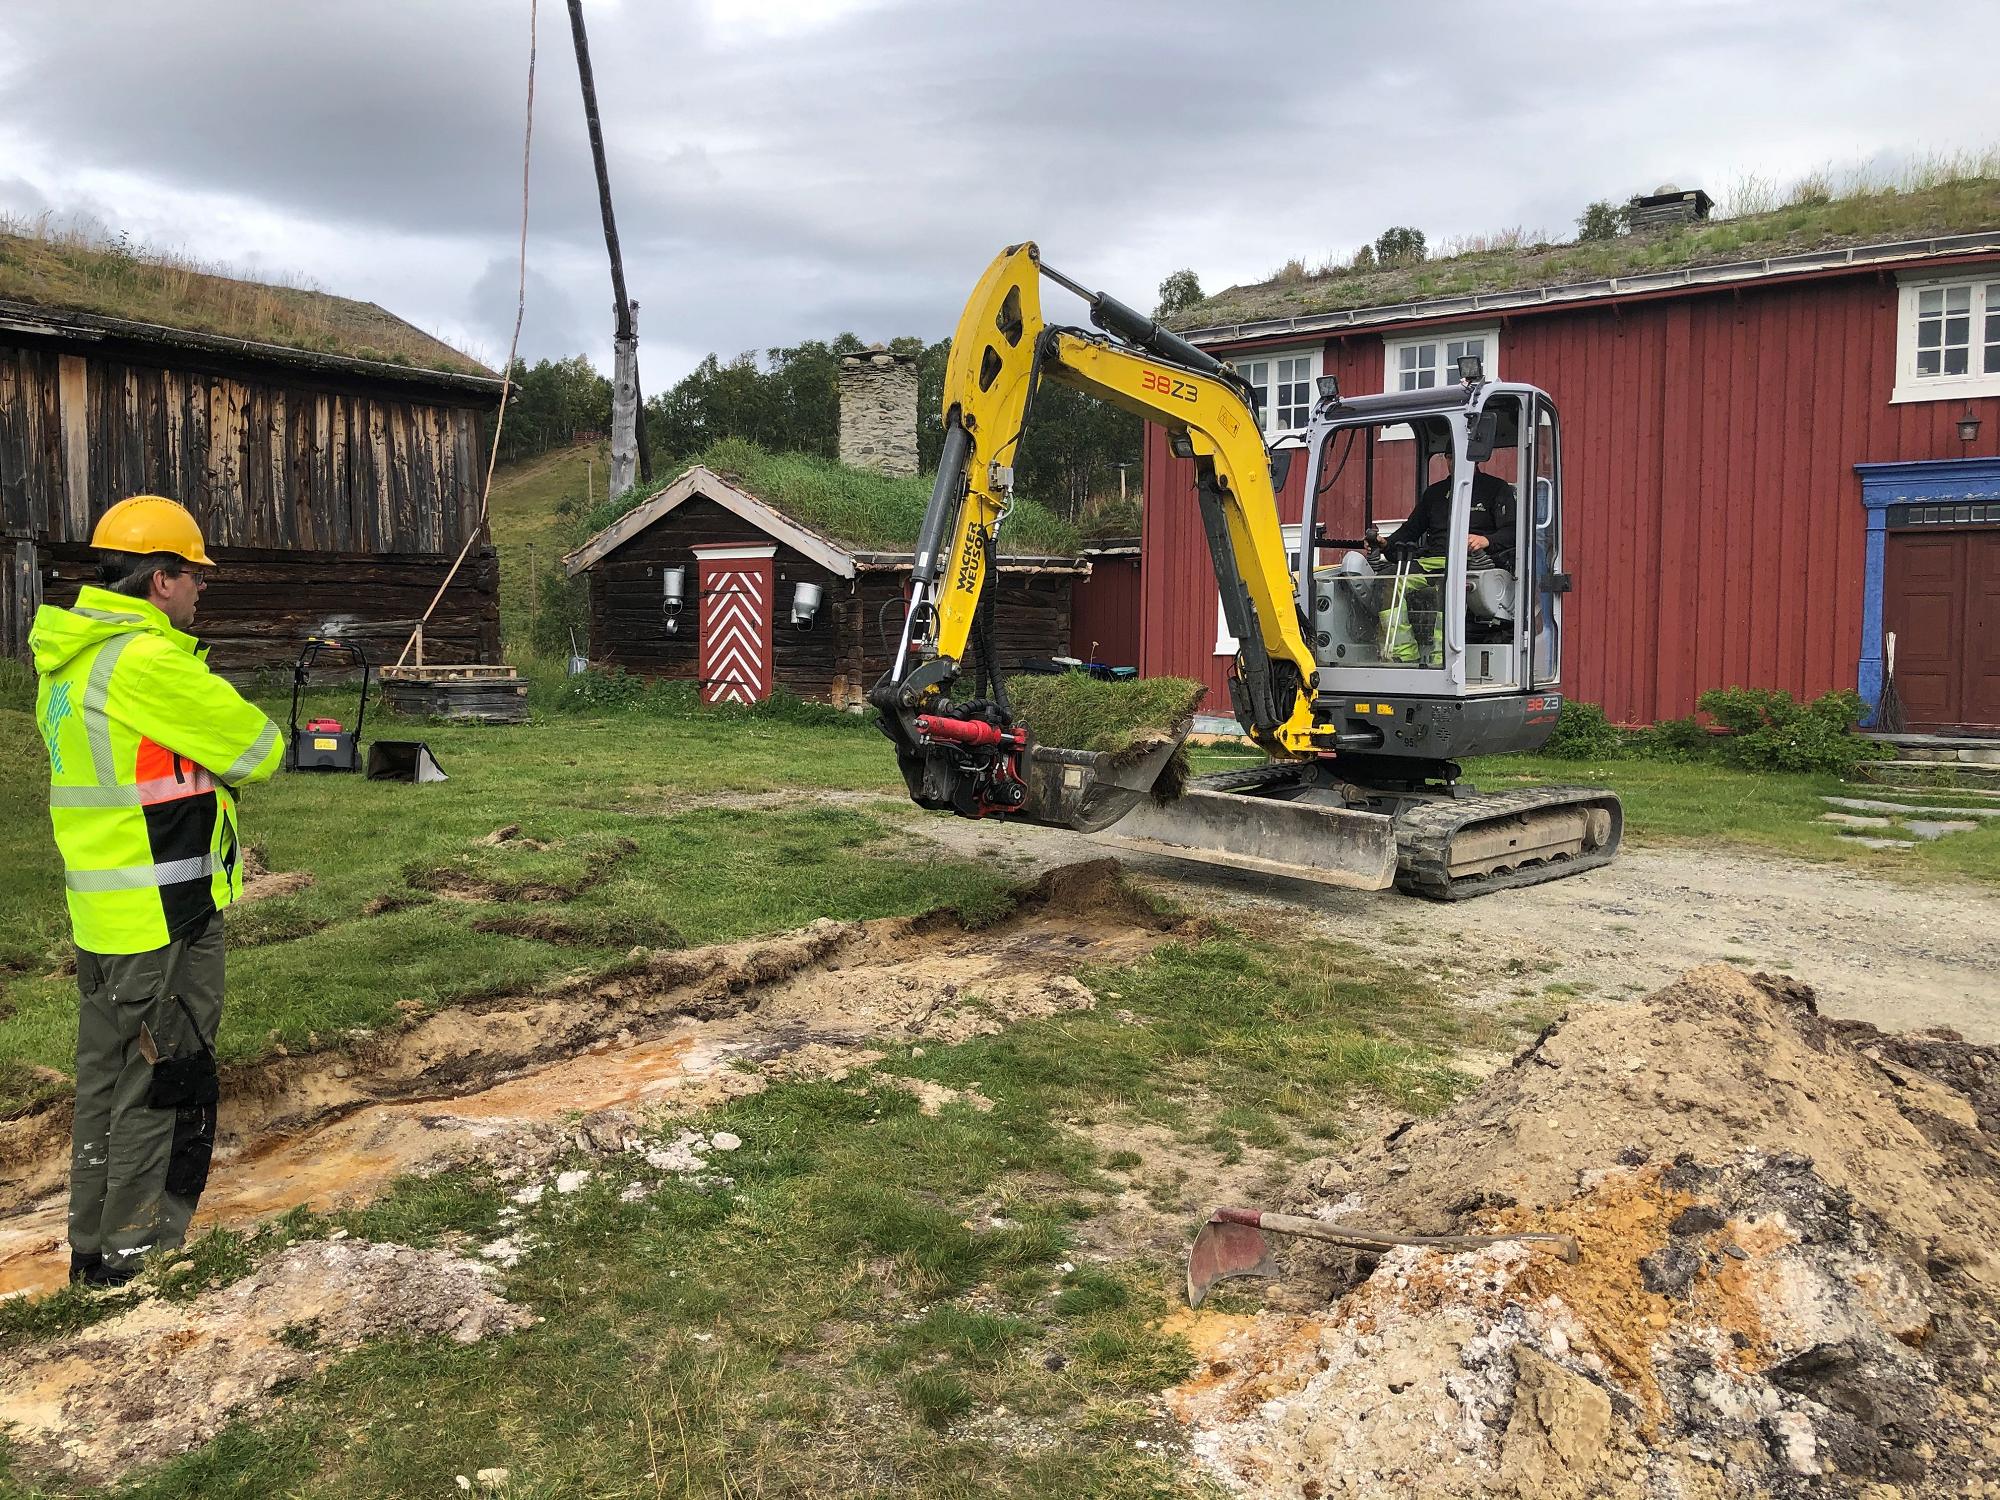 Prøvegraving i Aasengården. Foto: Magnus Borgos.